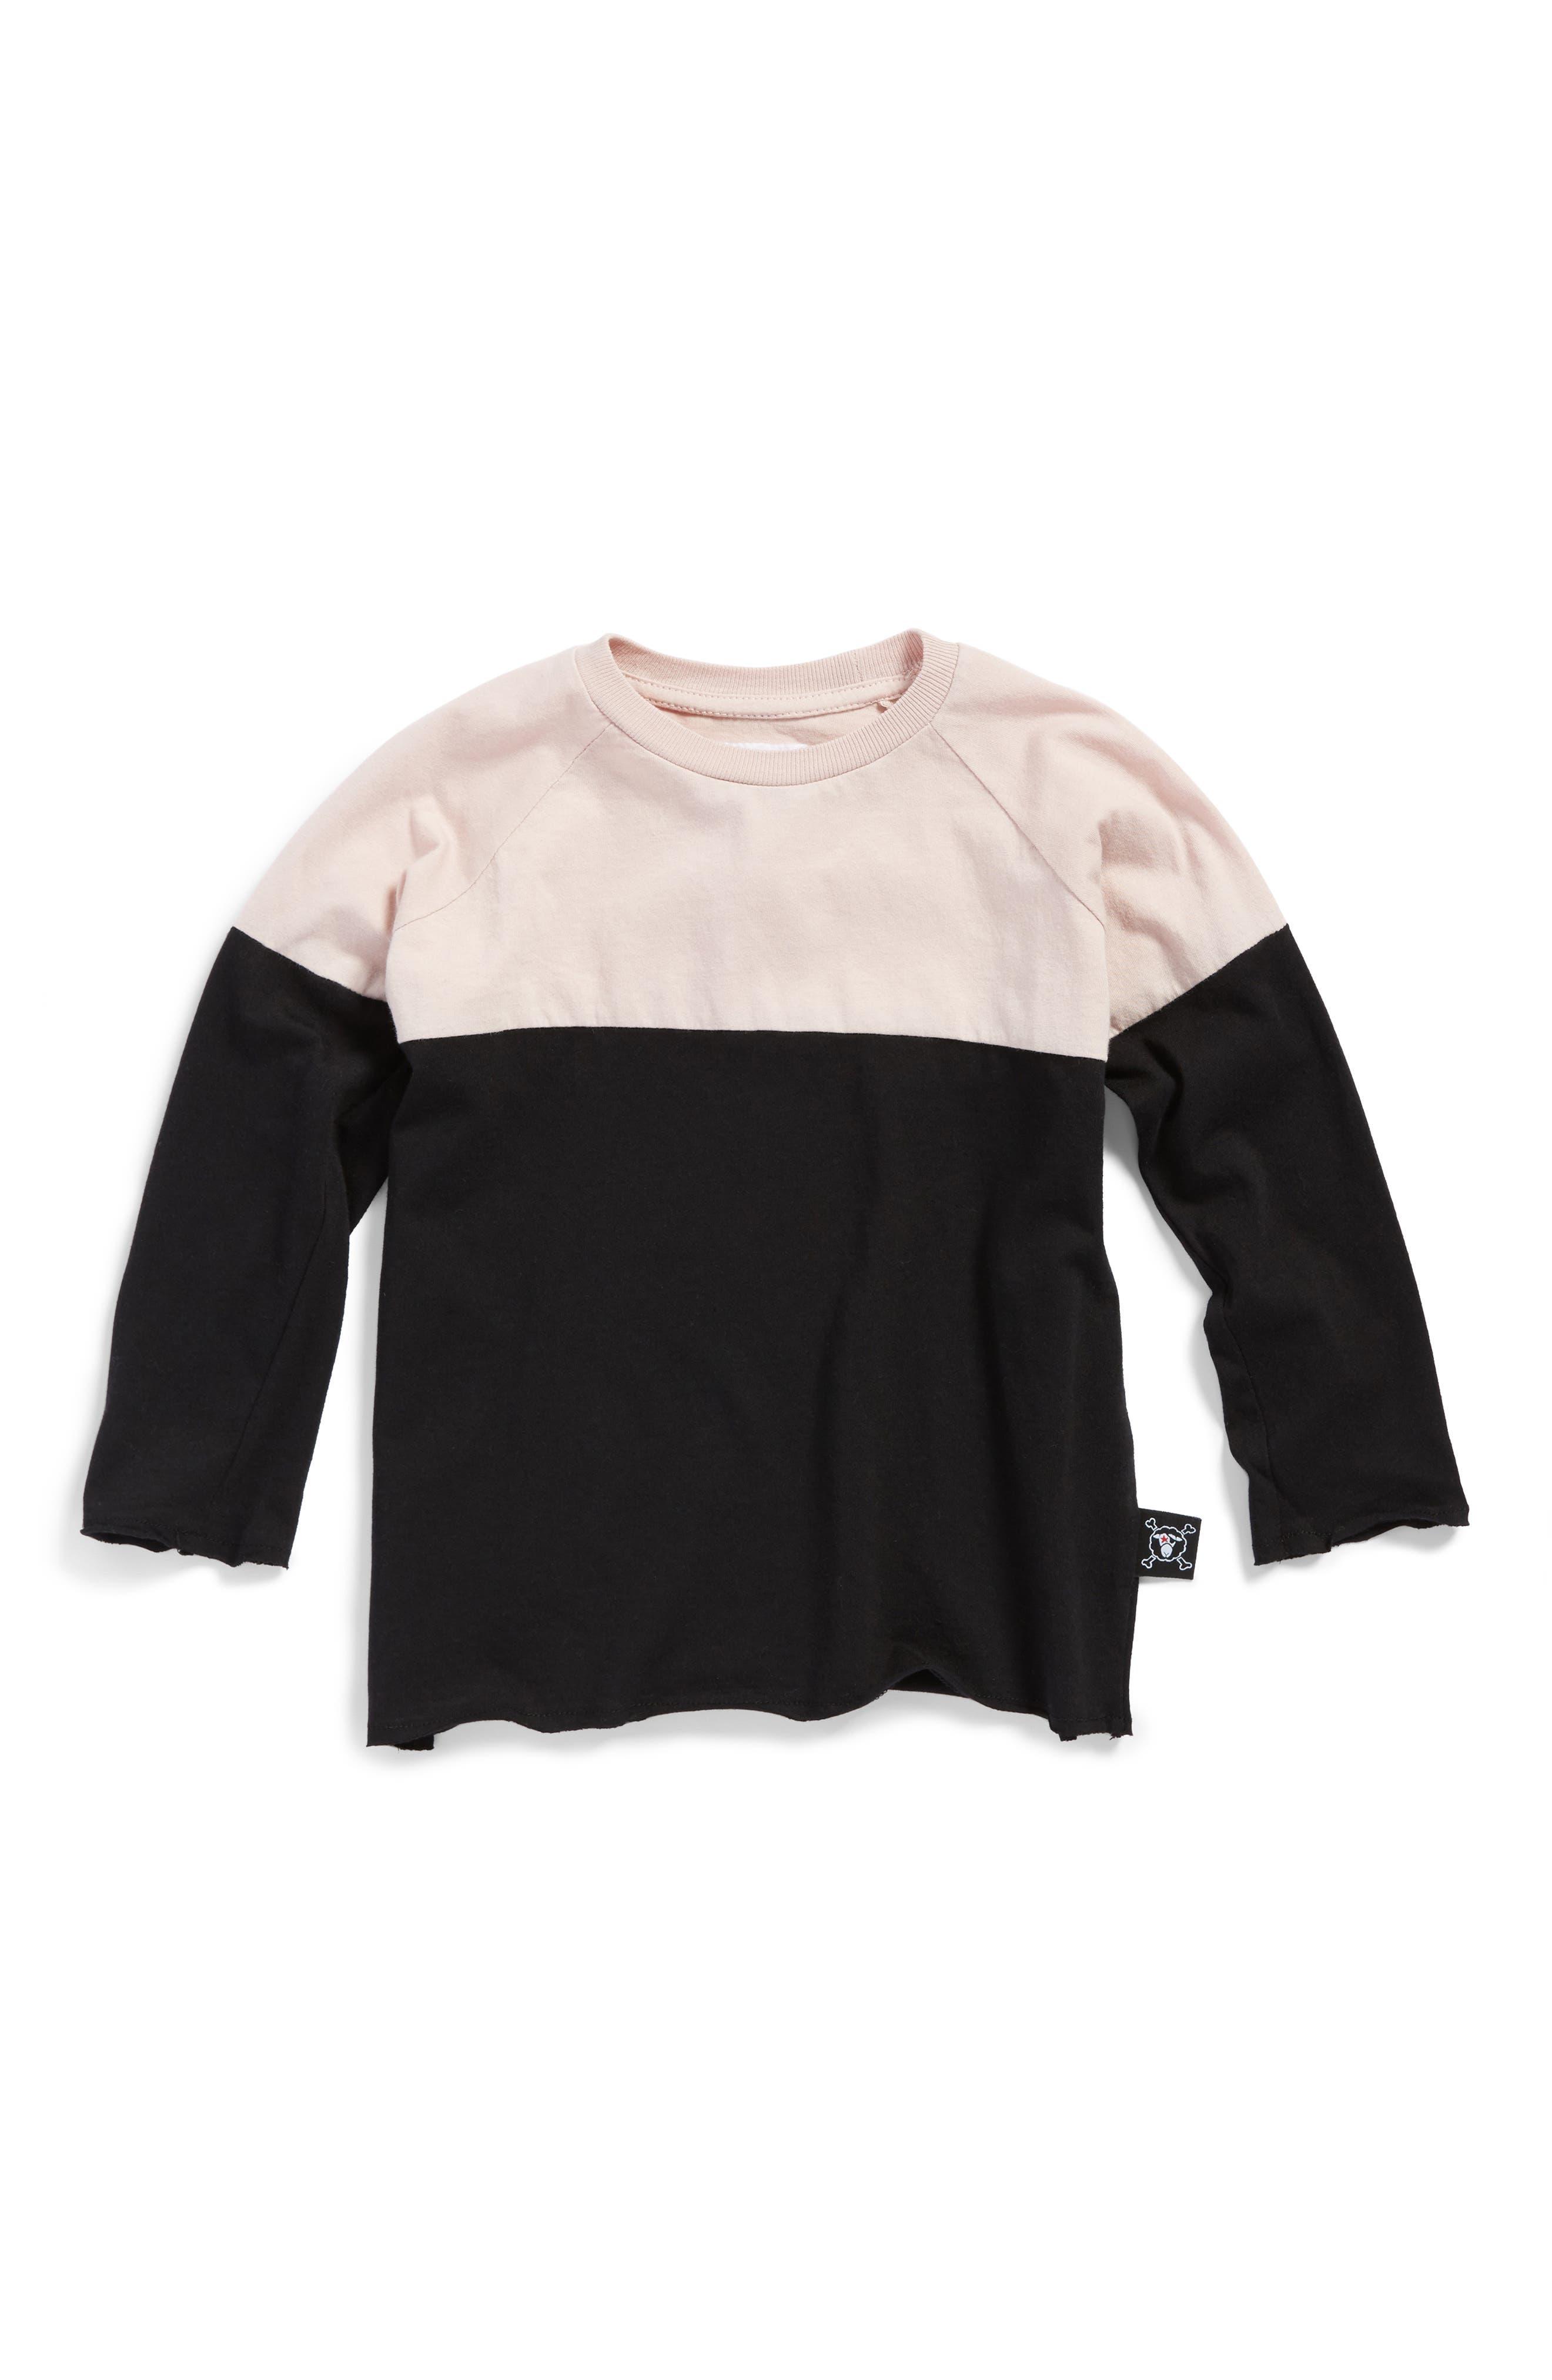 Alternate Image 1 Selected - NUNUNU Color Block Shirt (Toddler Girls & Little Girls)